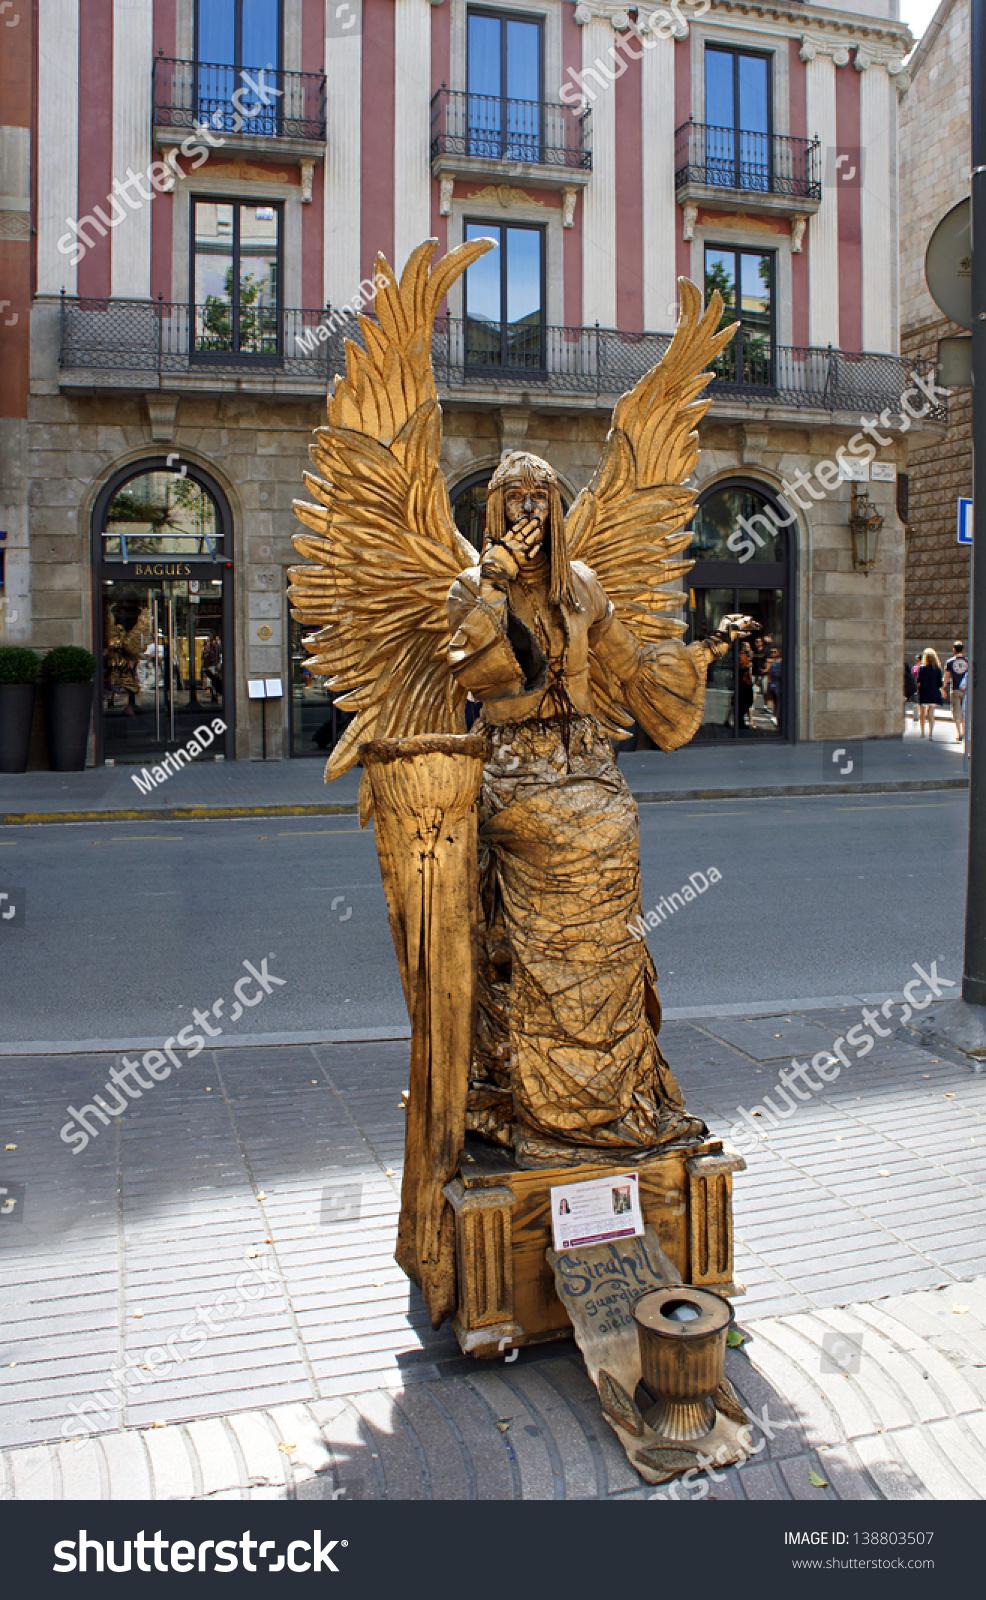 Barcelona May 29 Street Performer Imitating Statue